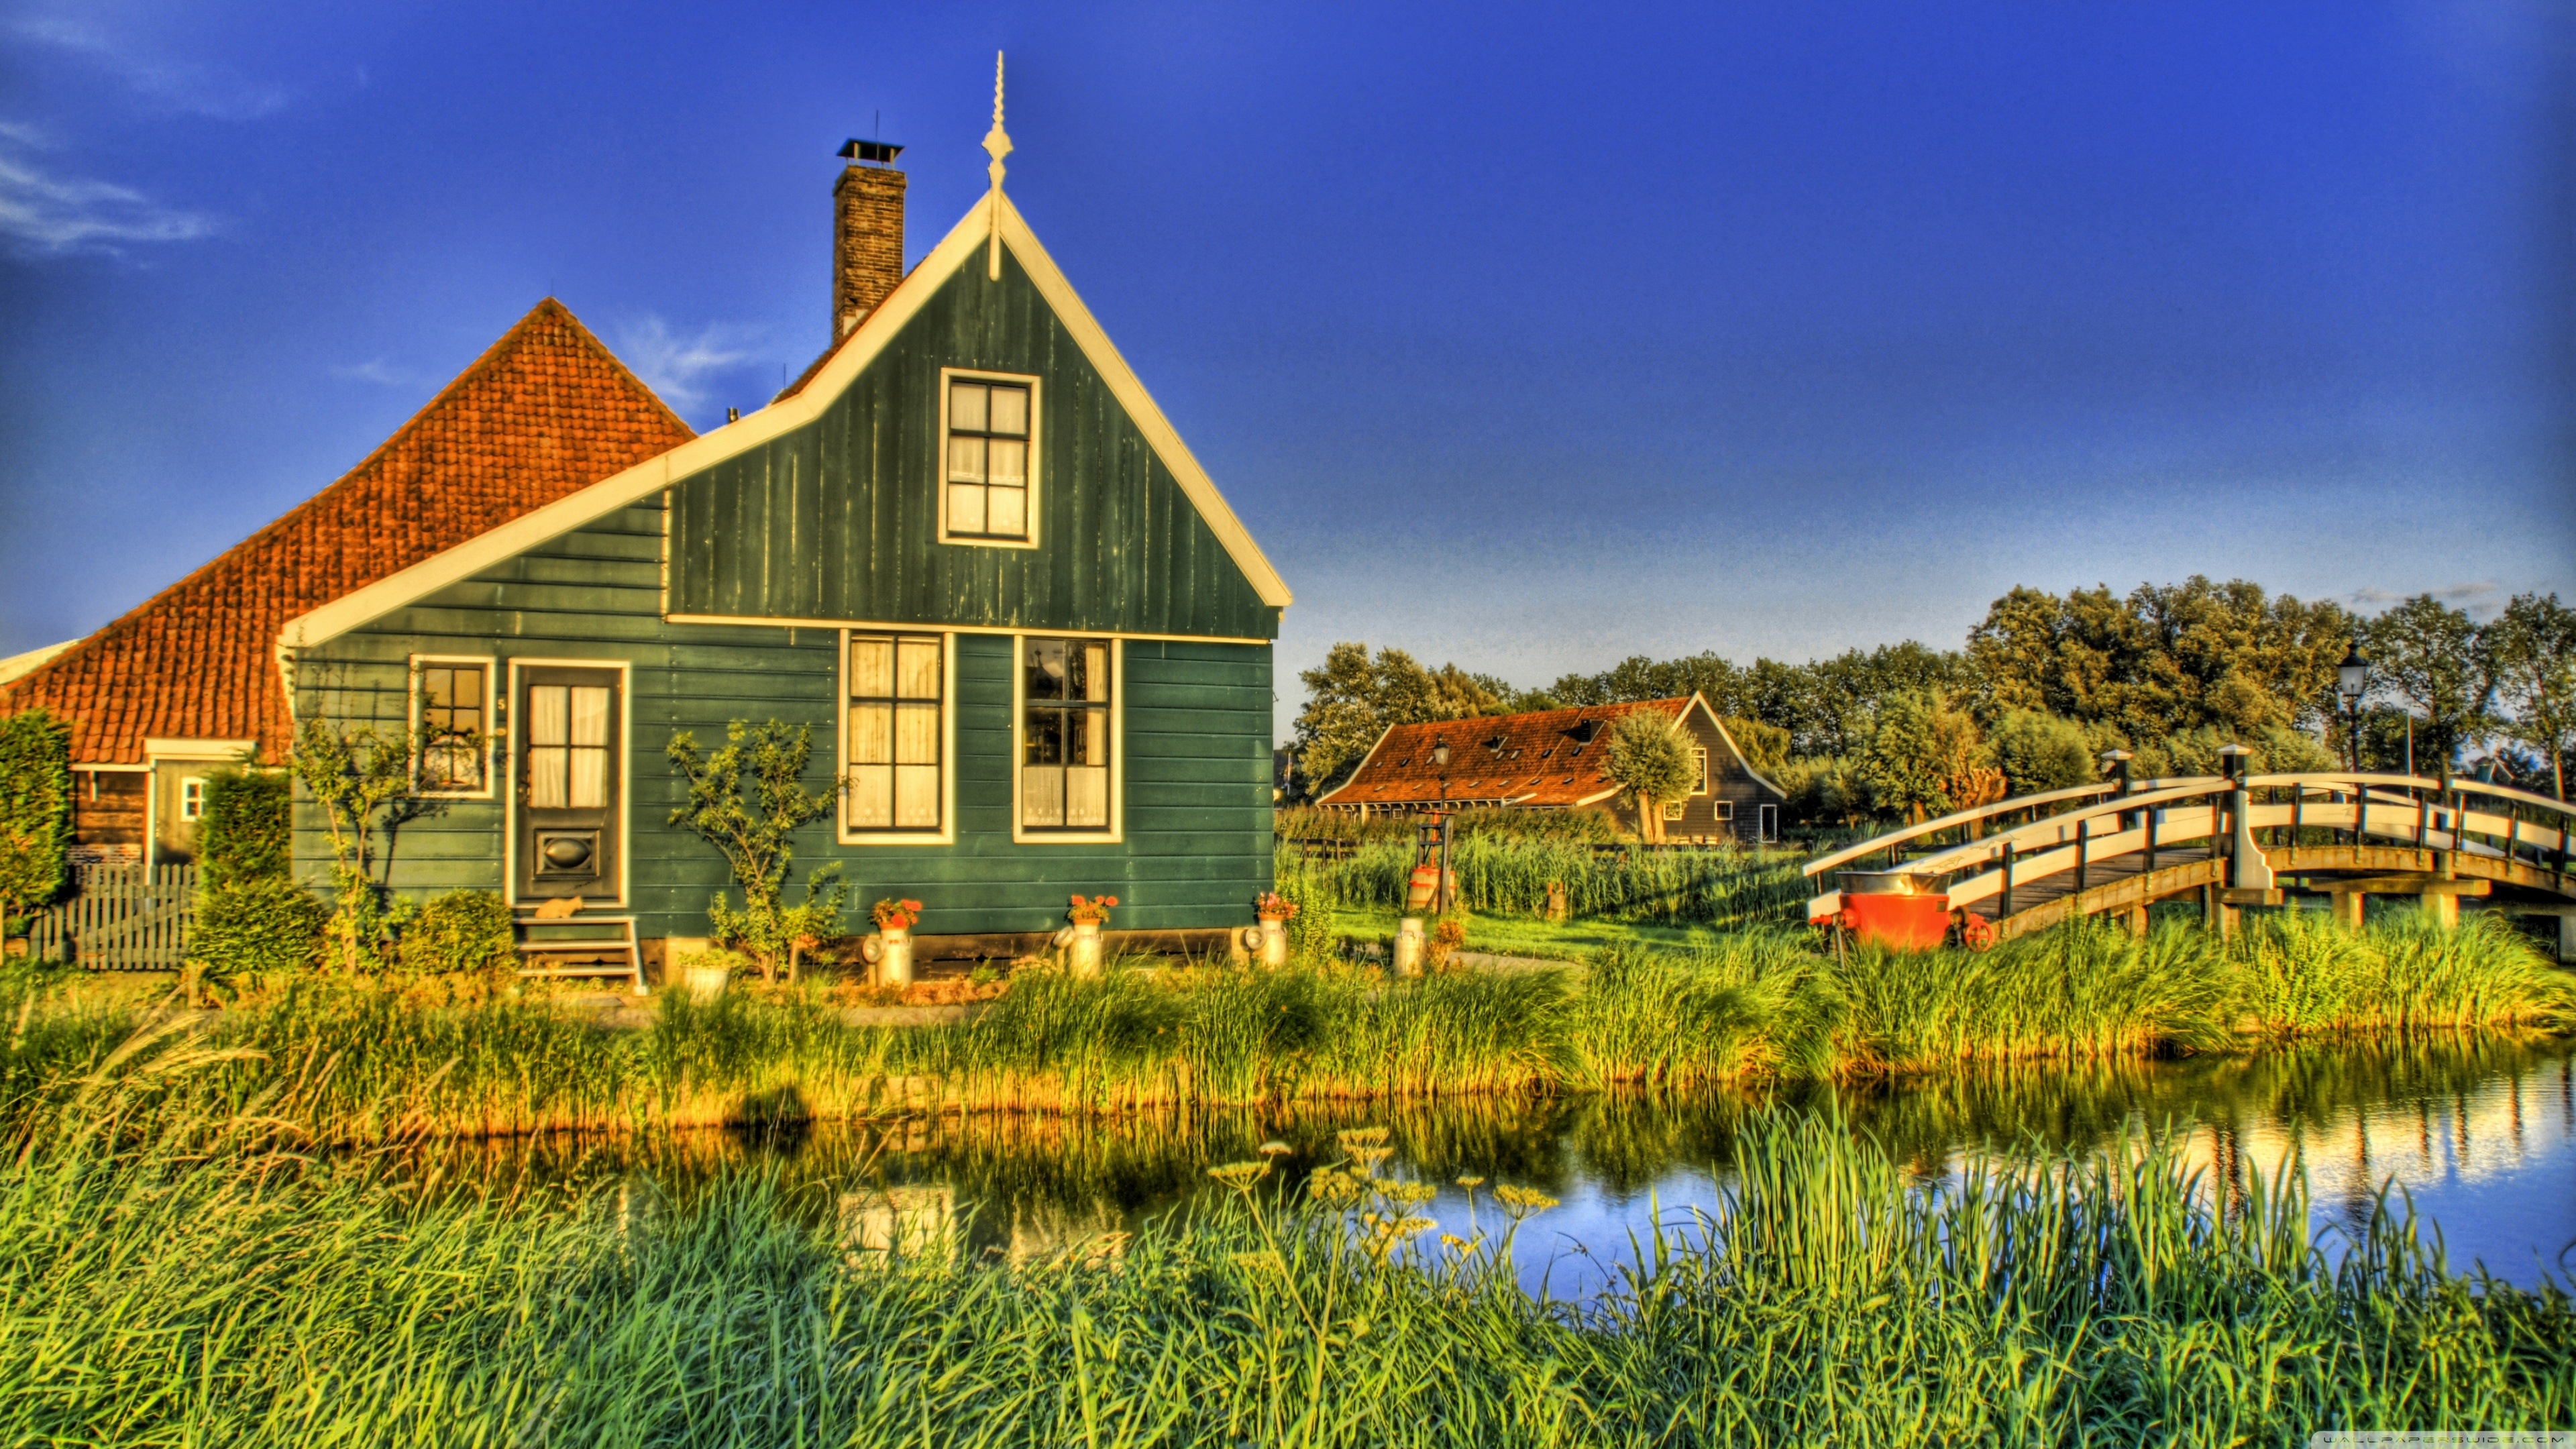 Holland Farmhouse 4K HD Desktop Wallpaper for 4K Ultra HD TV 3840x2160